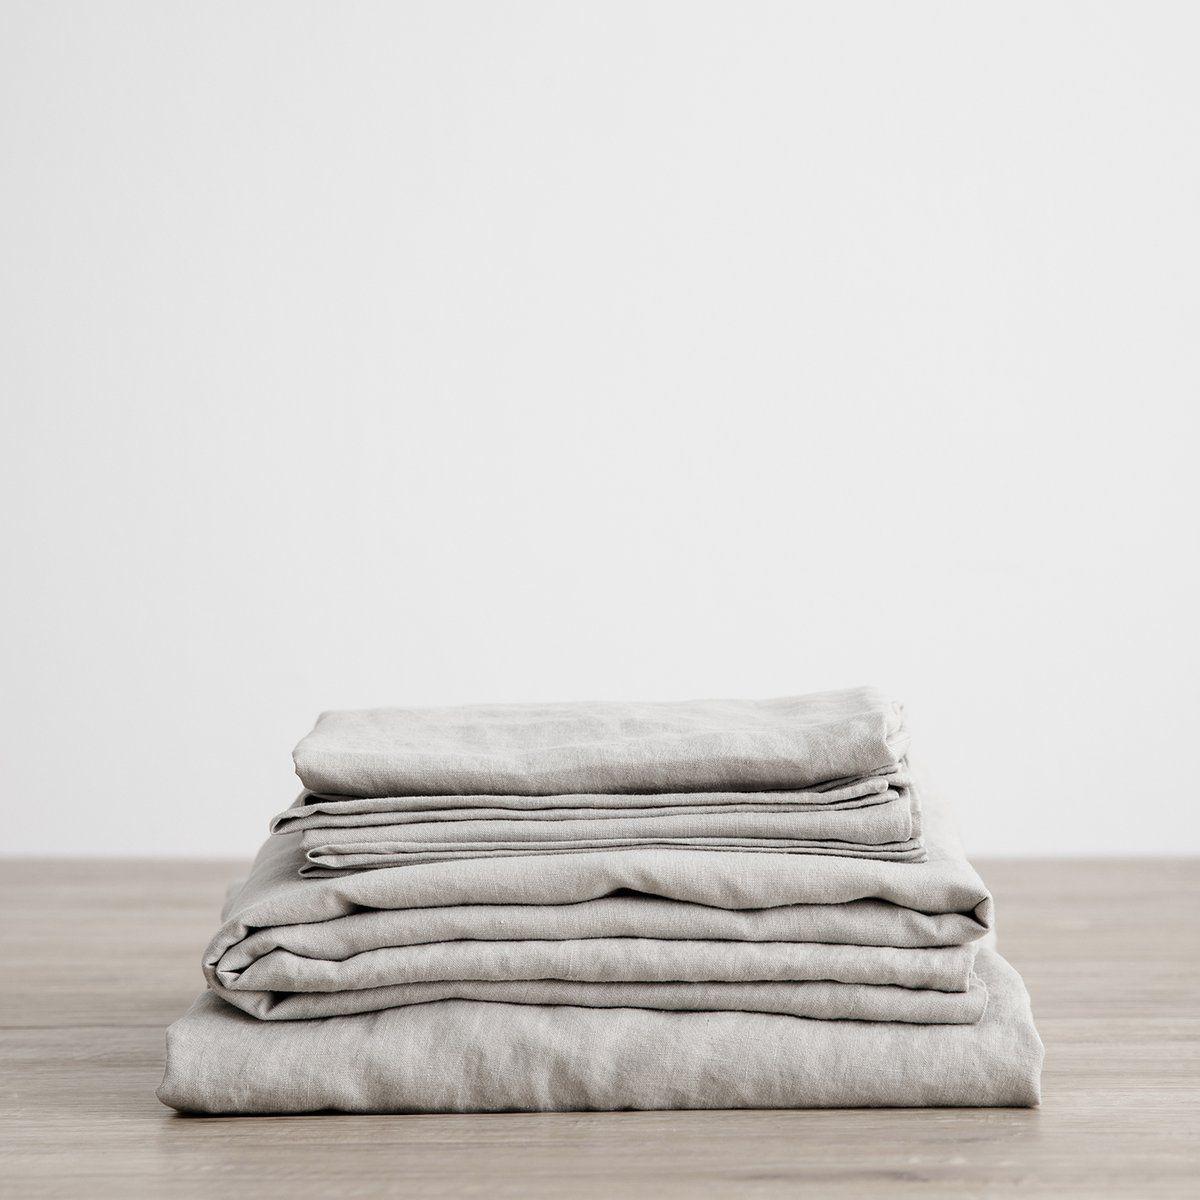 Linen Sheet Set With Pillowcases - Smoke Gray